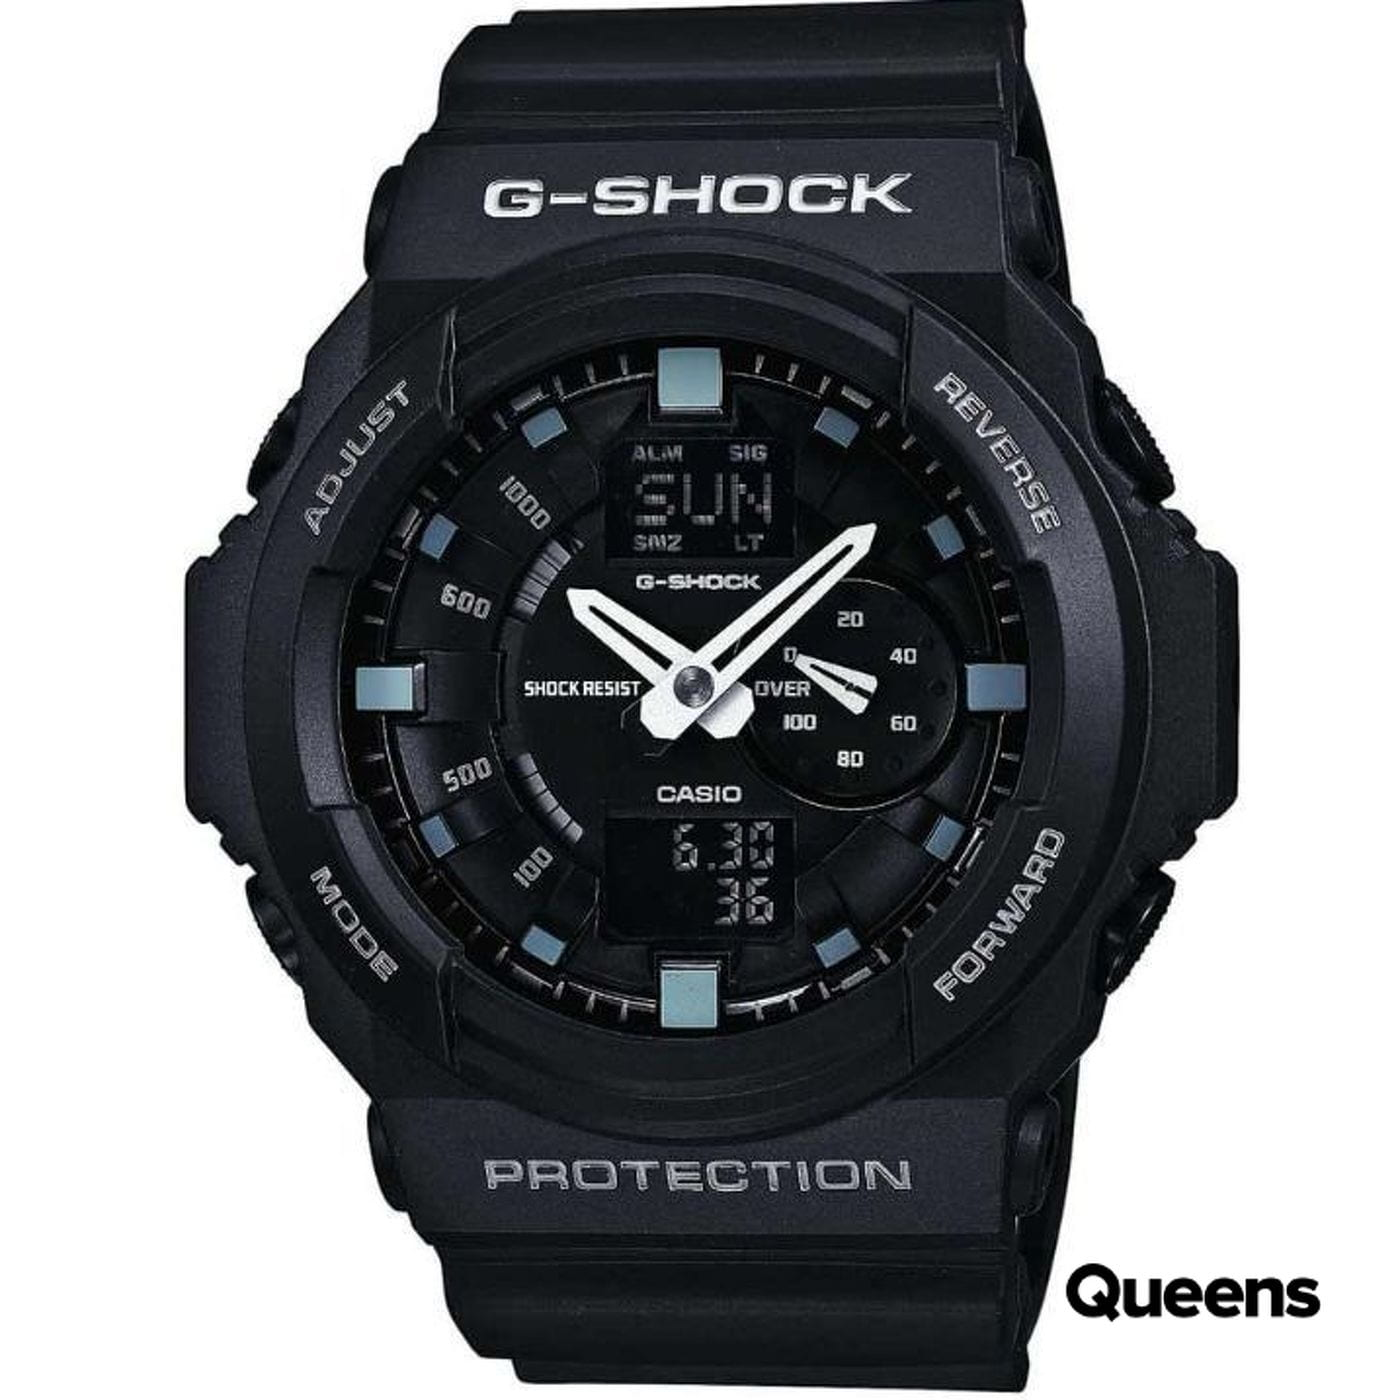 Casio G-Shock GA 150-1AER black